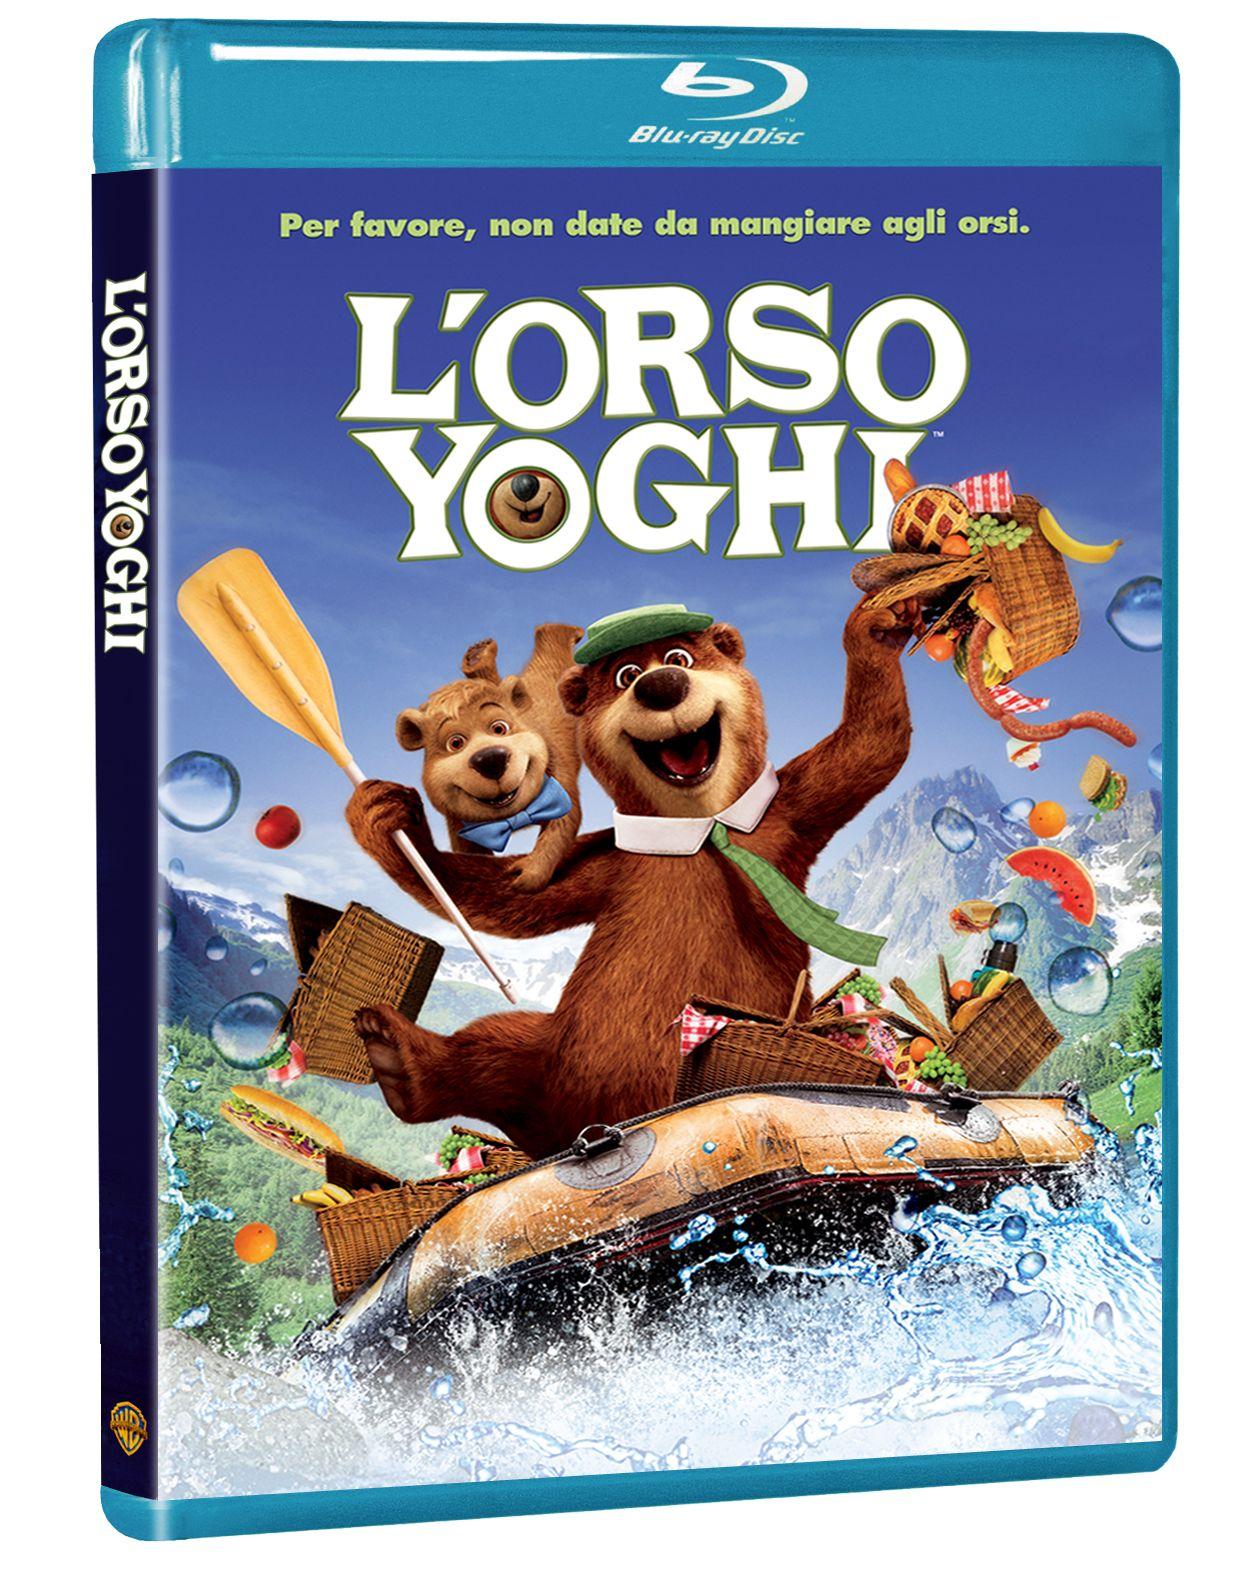 Orso Yoghi film blu-ray copertina